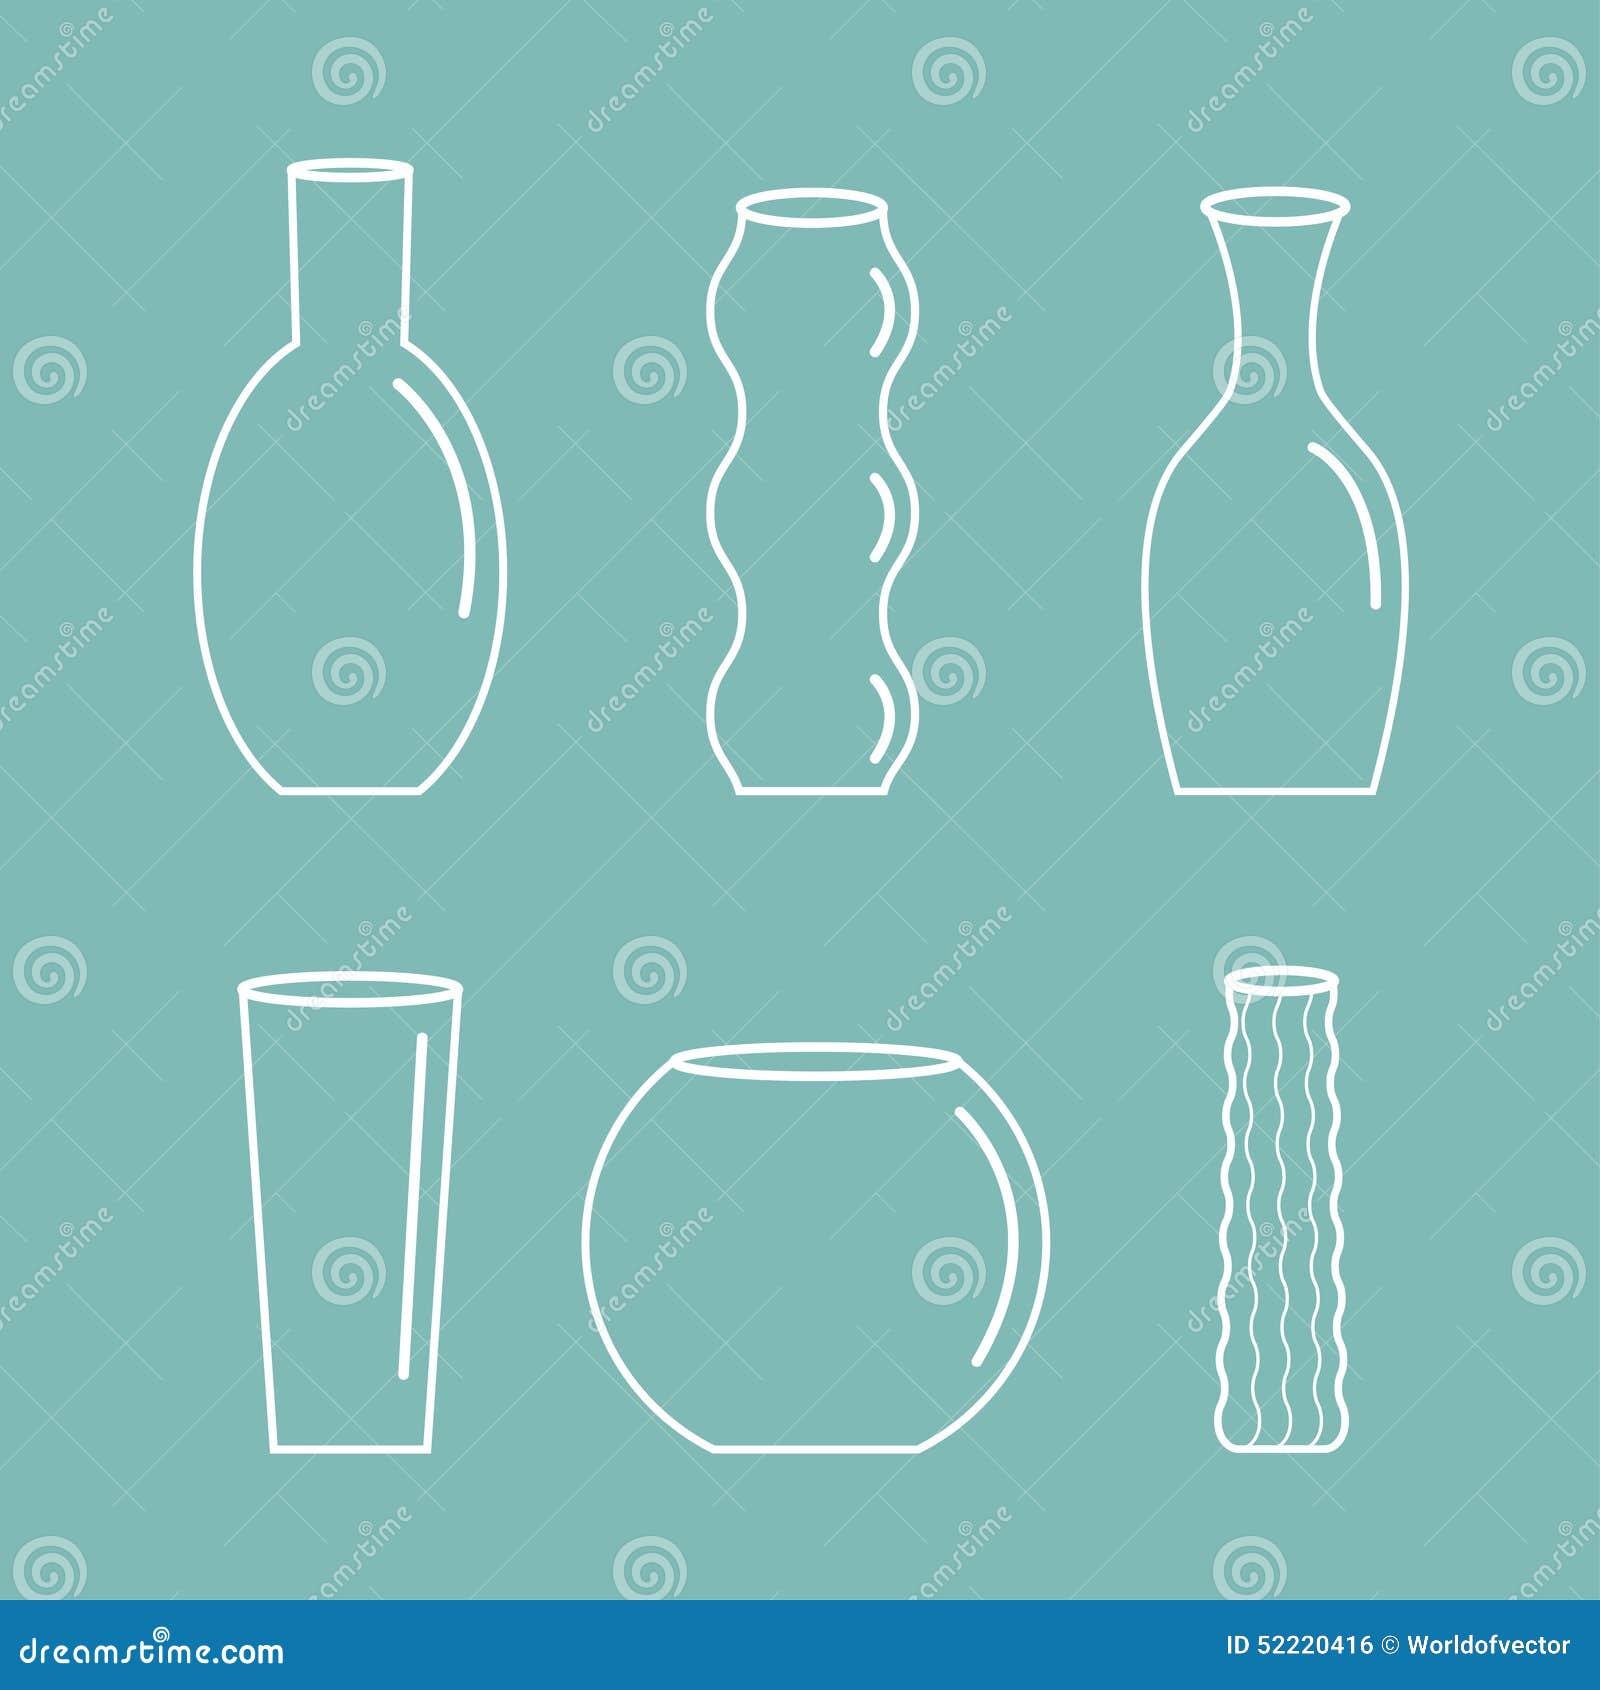 Vase outline icon set ceramic pottery glass flower decoration blue vase outline icon set ceramic pottery glass flower decoration blue background flat design reviewsmspy